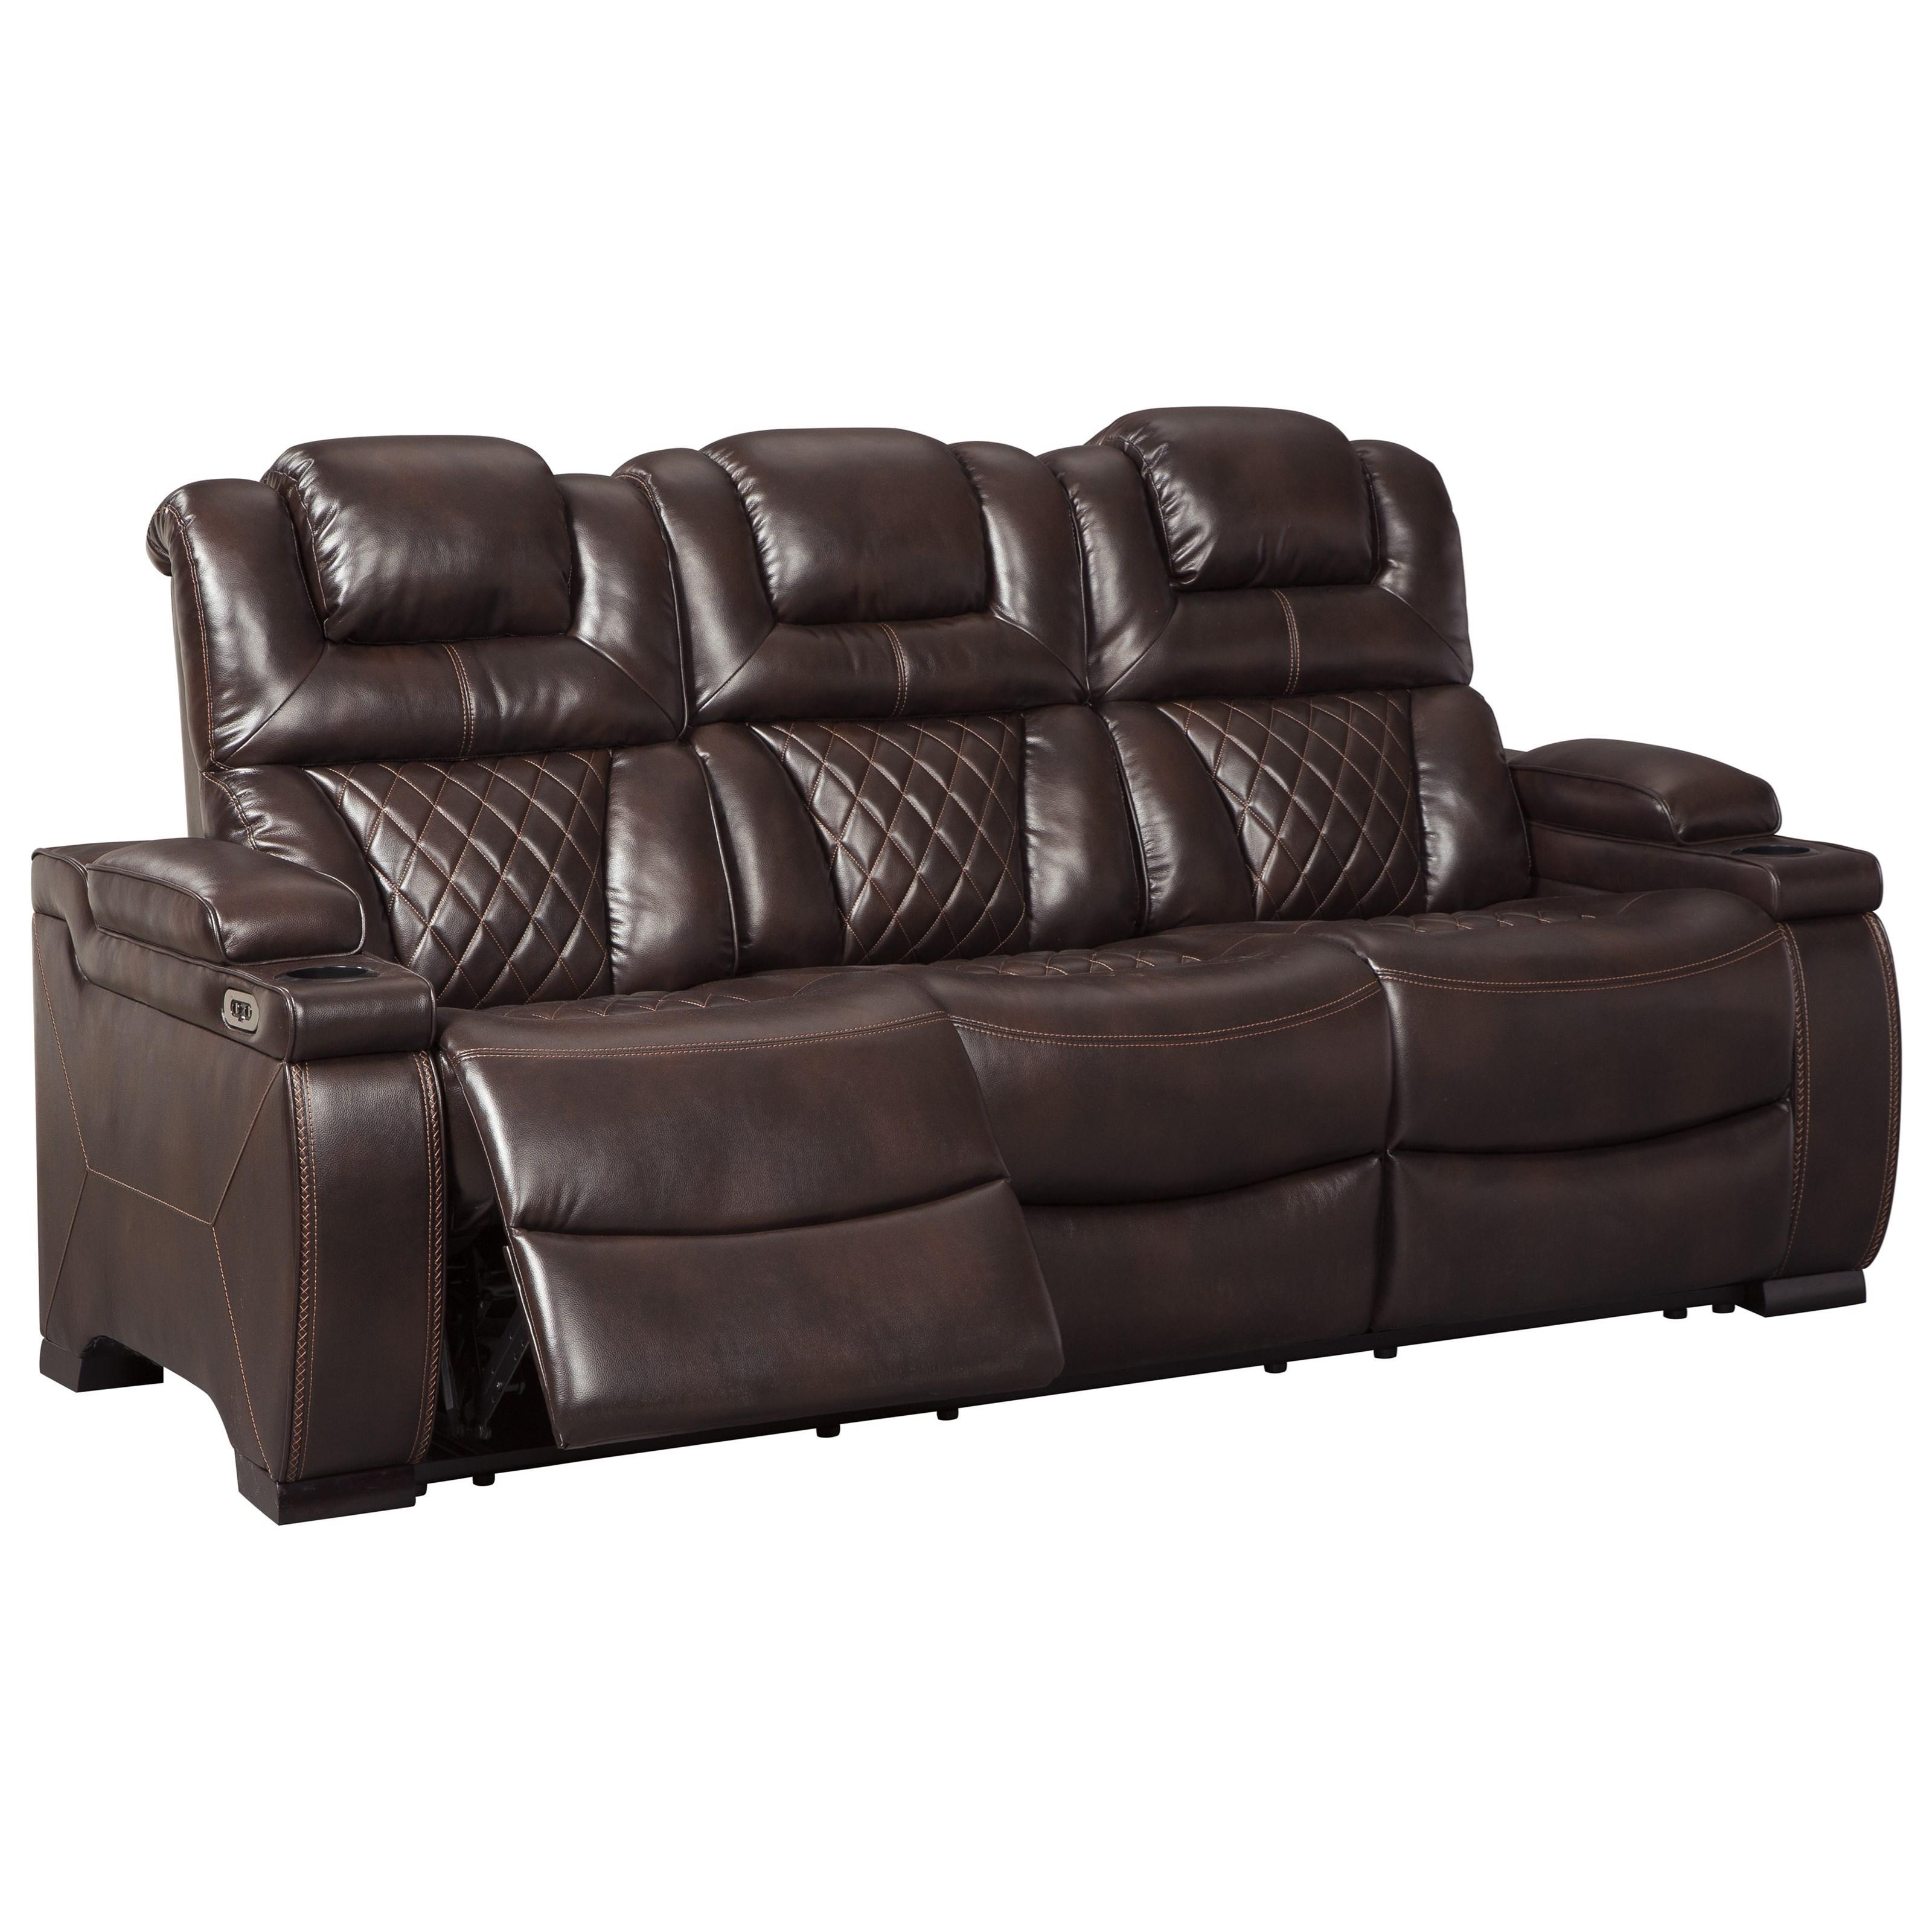 Signature Design Couch: Signature Design By Ashley Warnerton Power Reclining Sofa